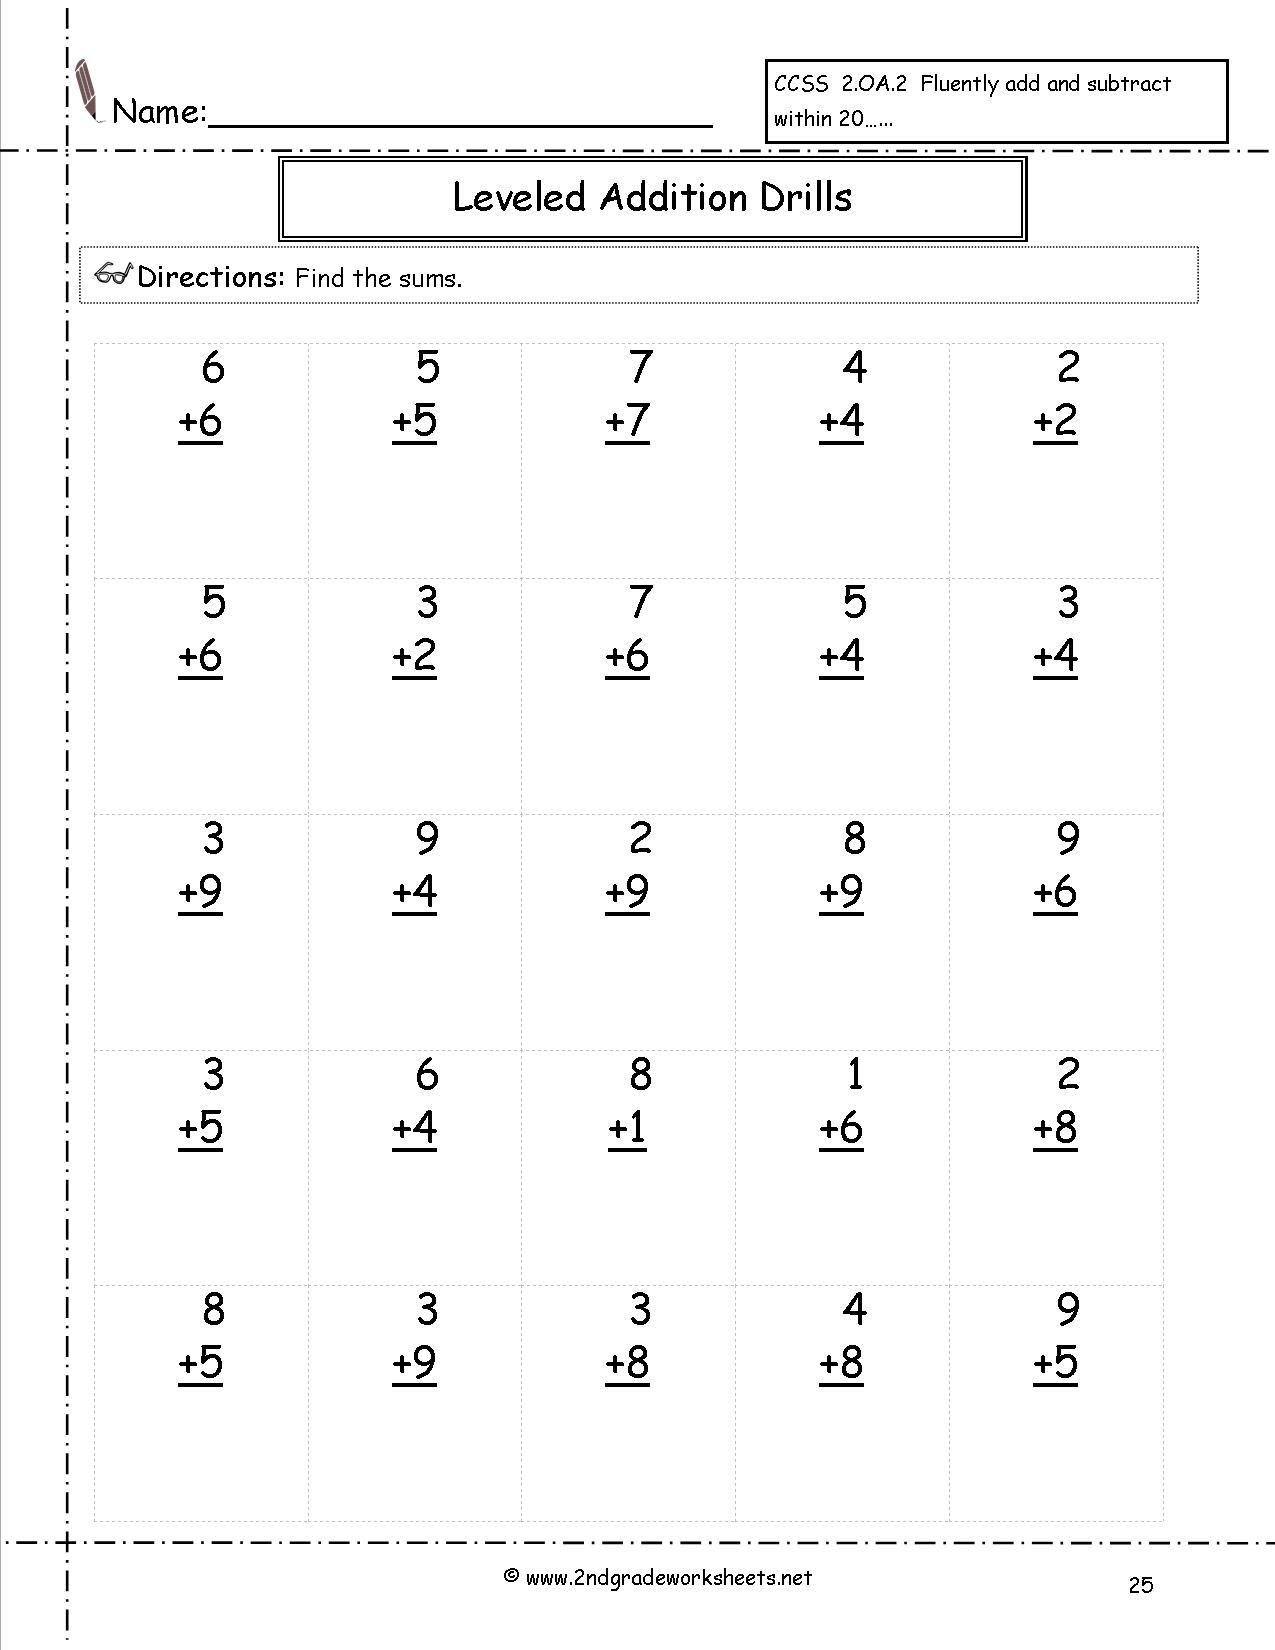 Free Math Worksheets And Printouts | Printable Second Grade Math Worksheets